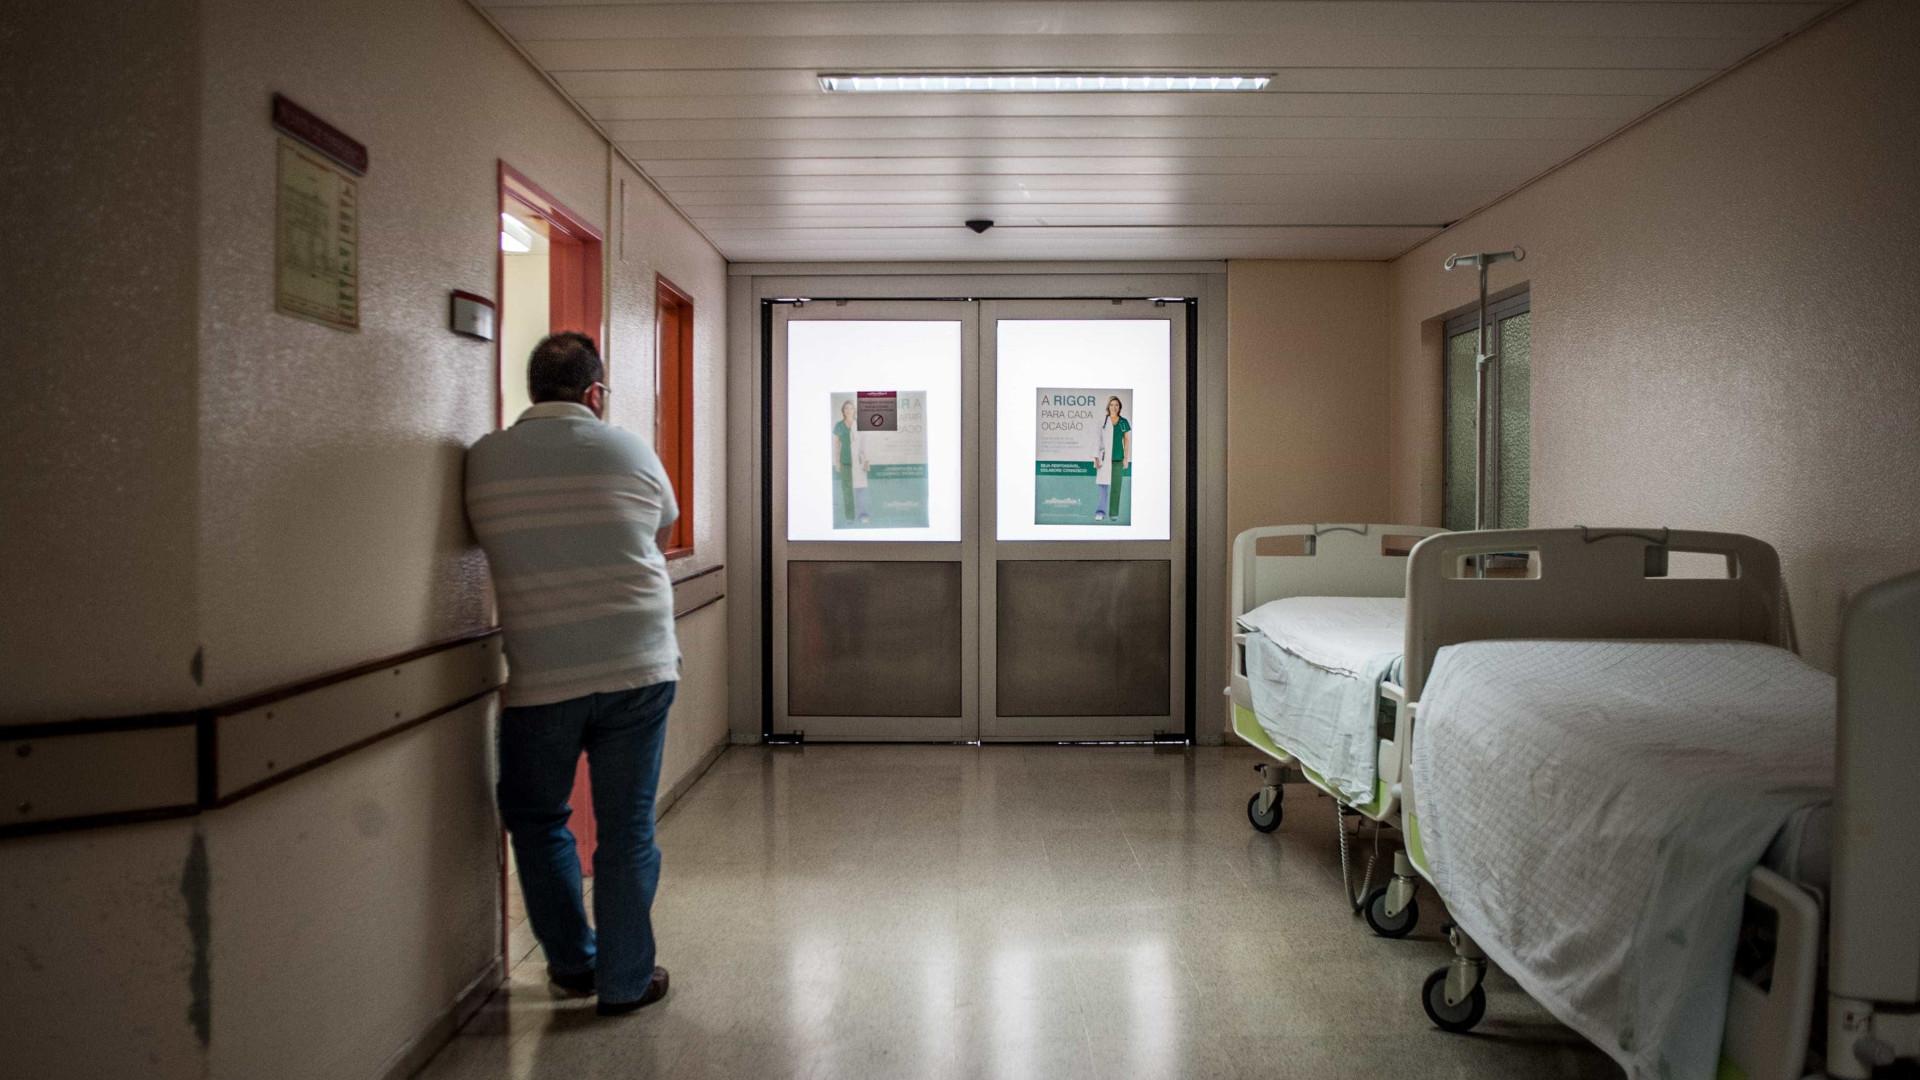 Planos de saúde personalizados alargados a todos a partir de 2019